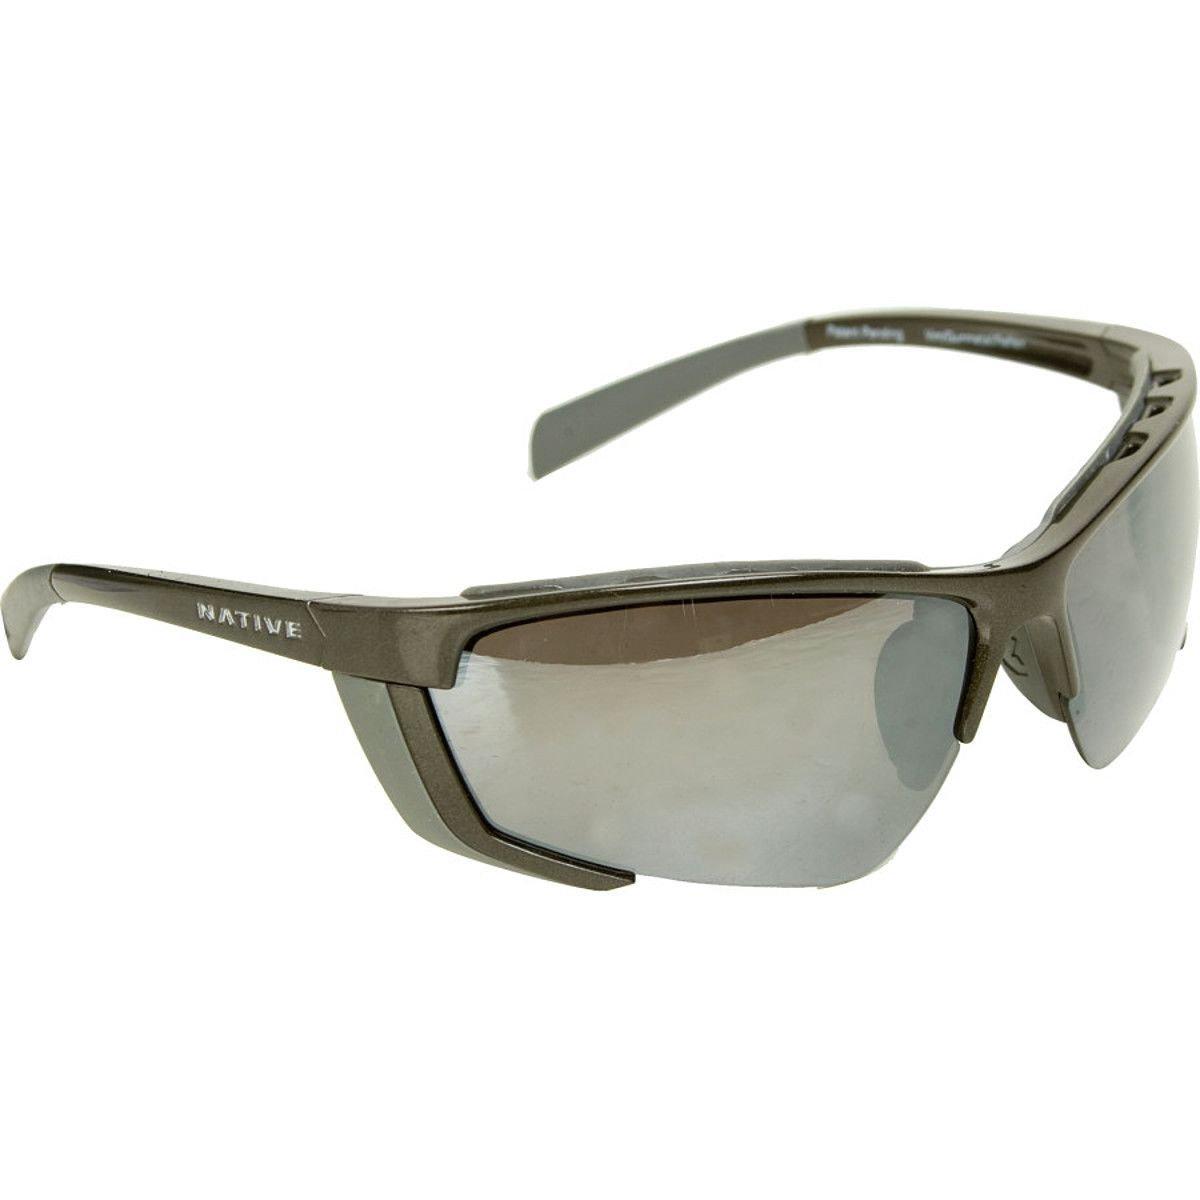 Native Eyewear Vim Sunglasses (Gunmetal, Copper)